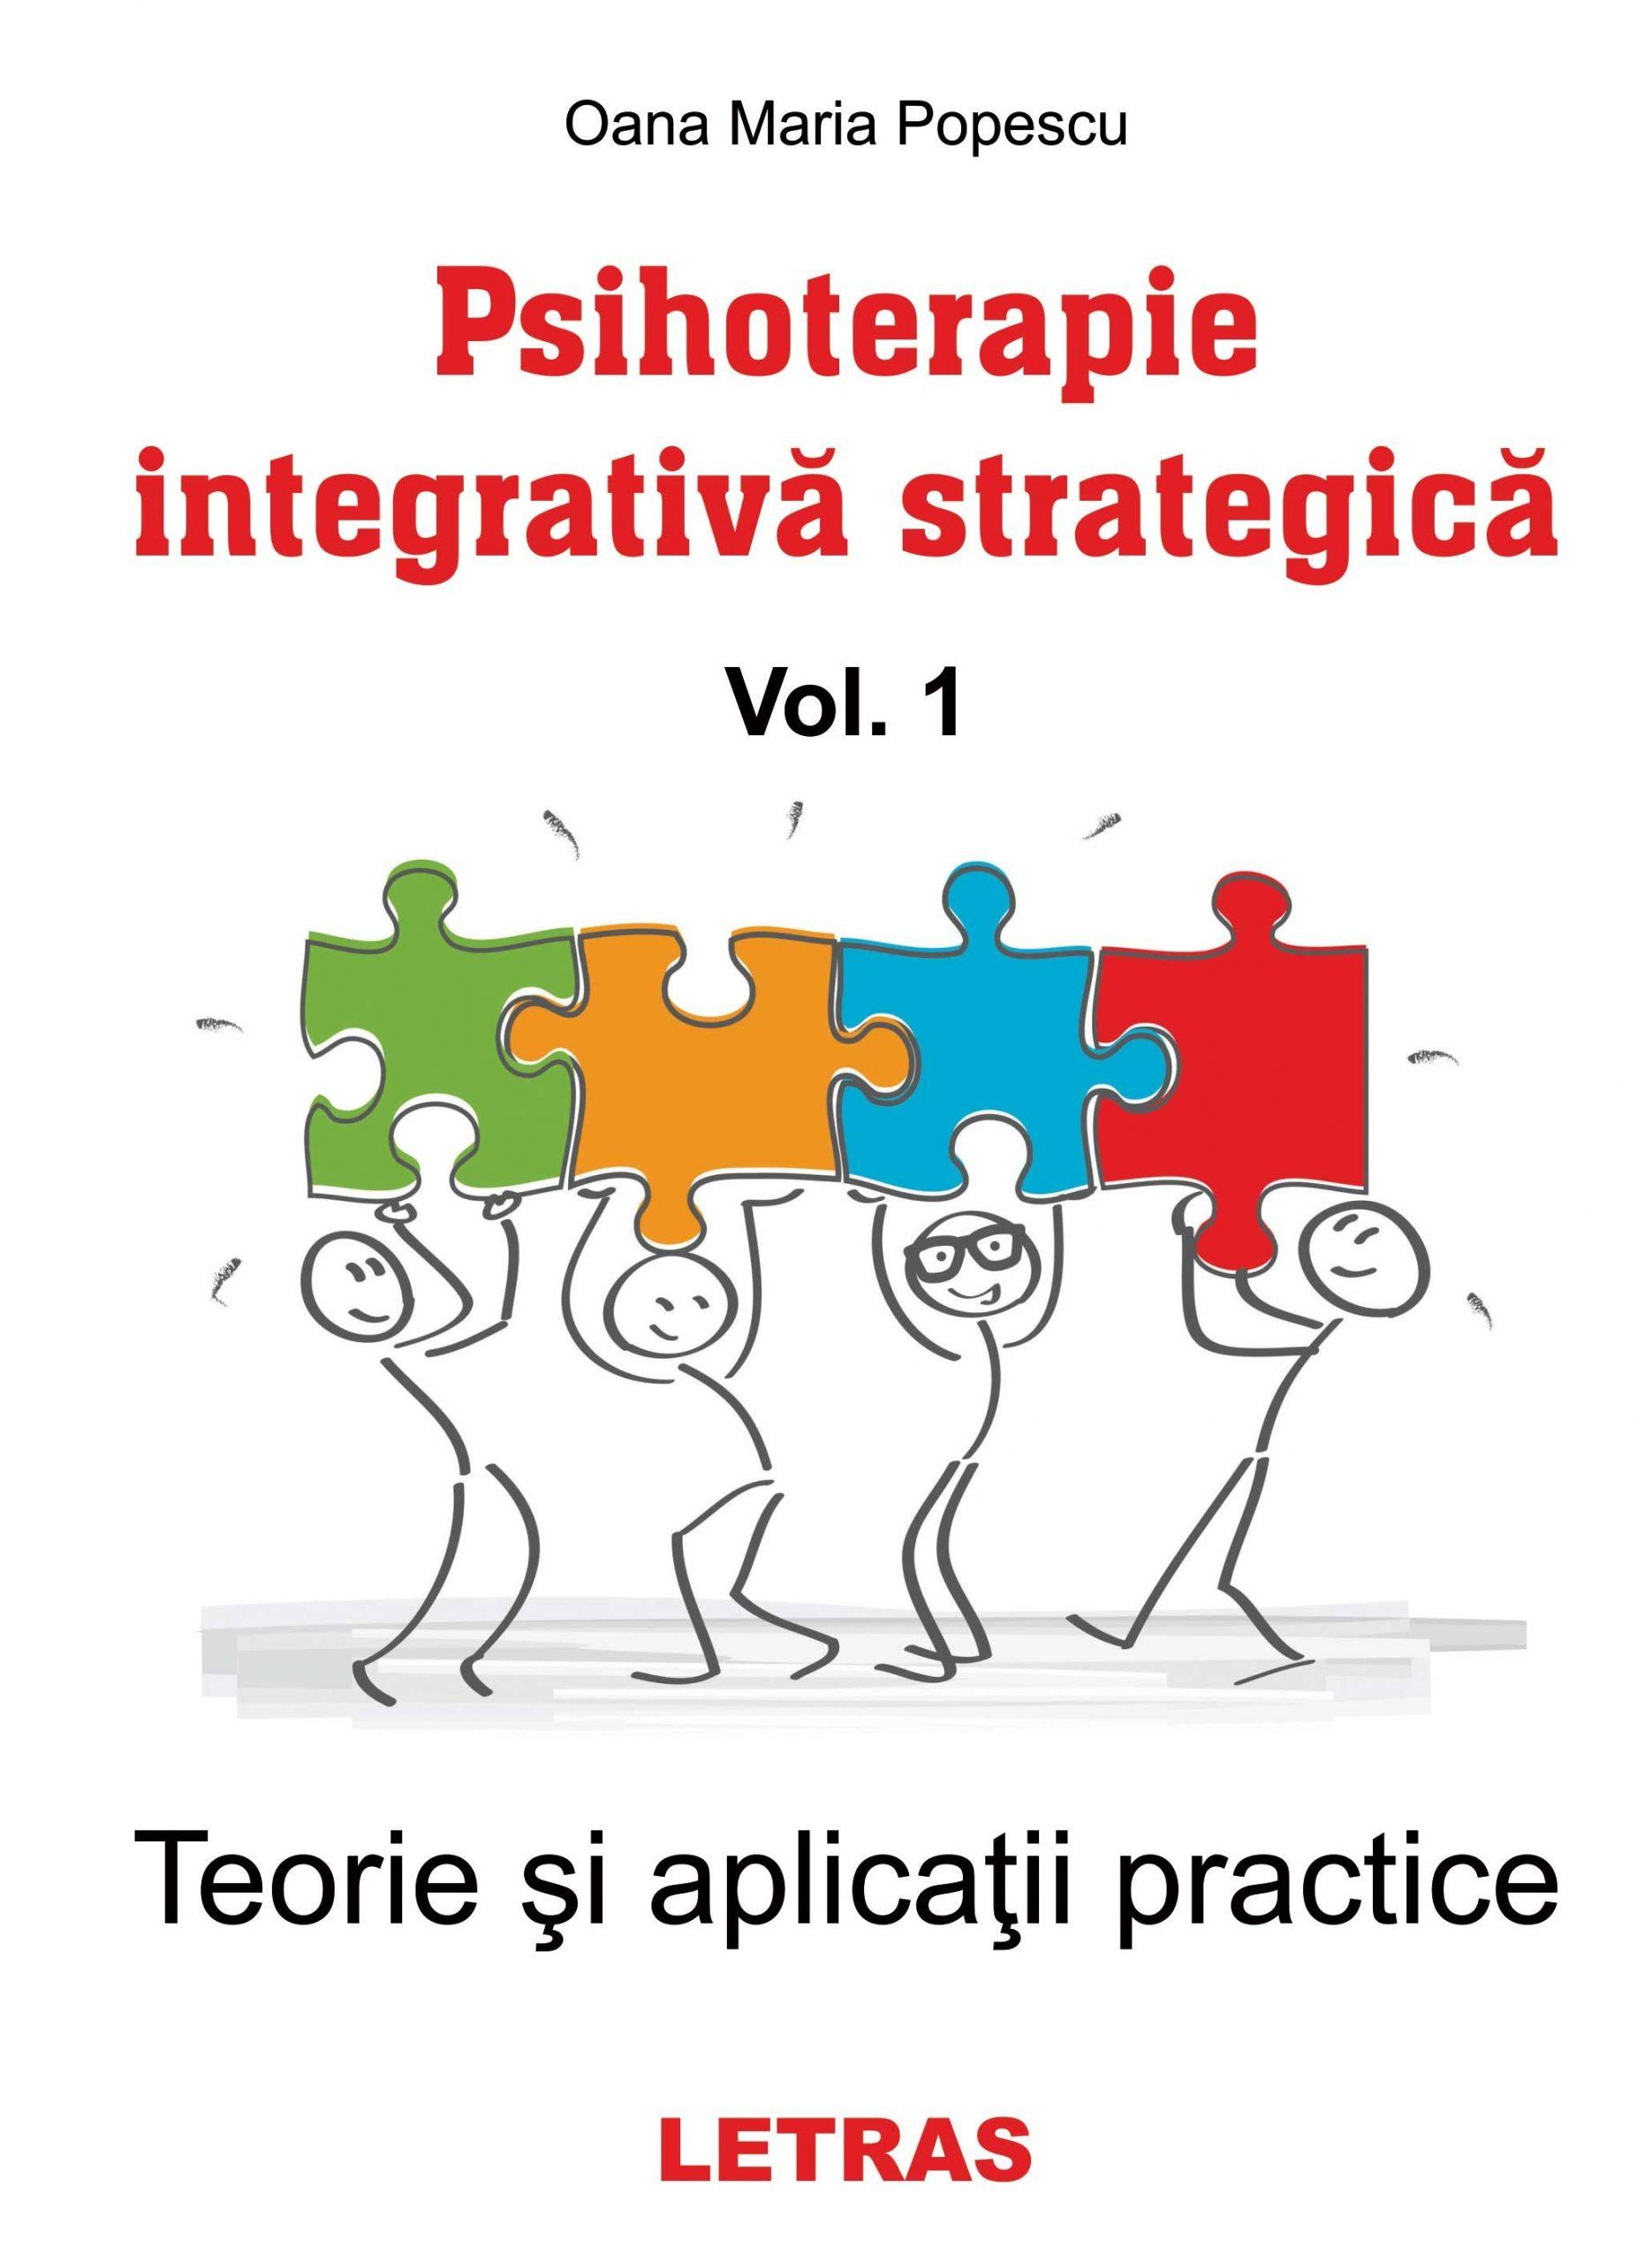 Popescu-Oana_Psihoterapie-integrativa_coperte